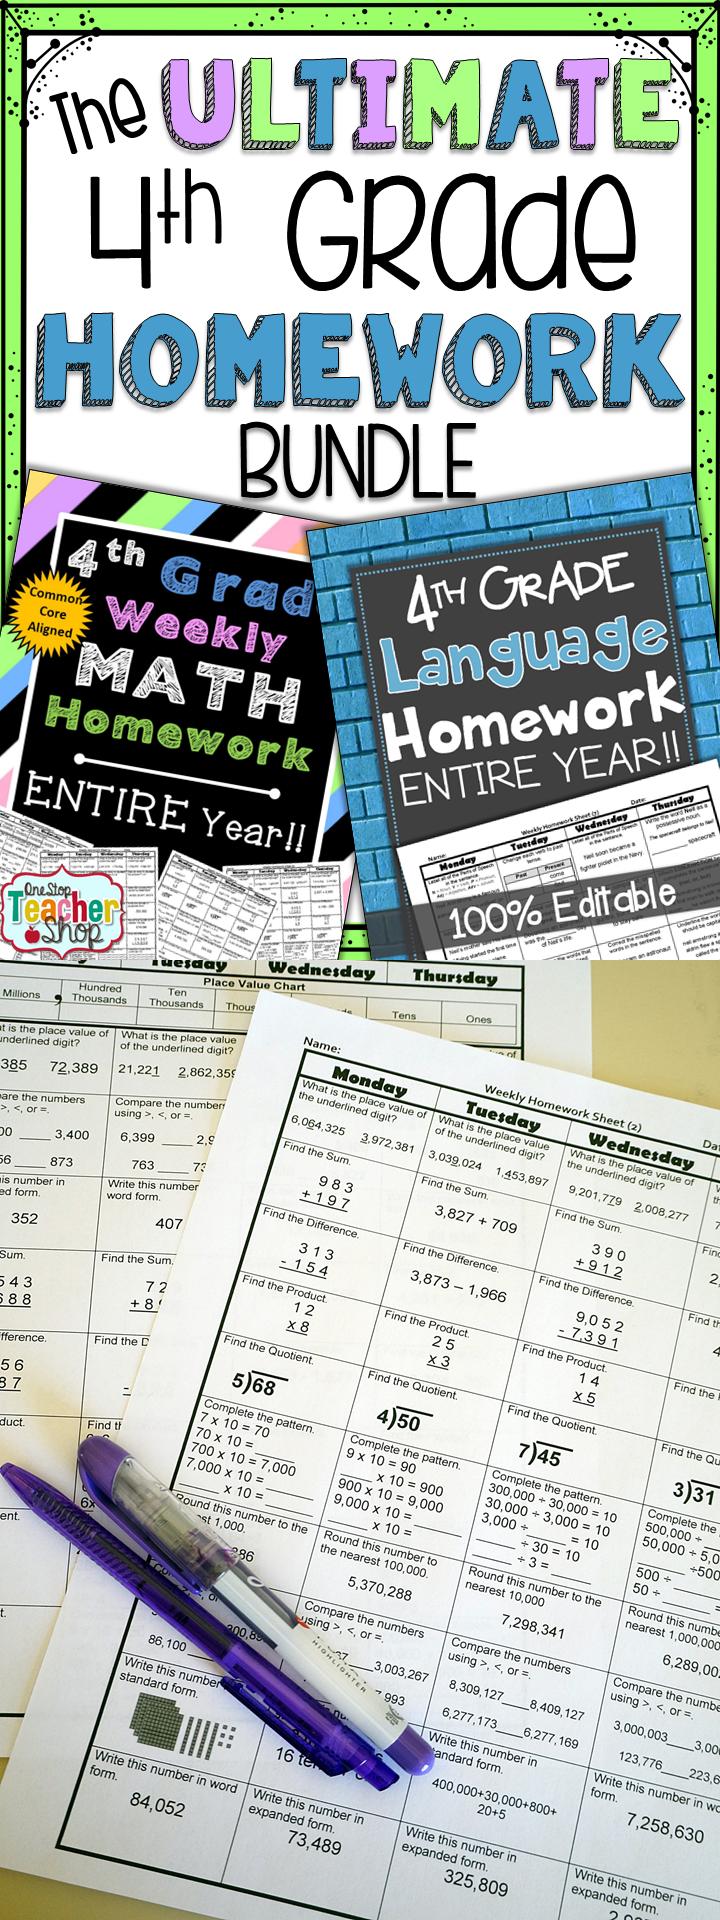 Help with math homework 4th grade